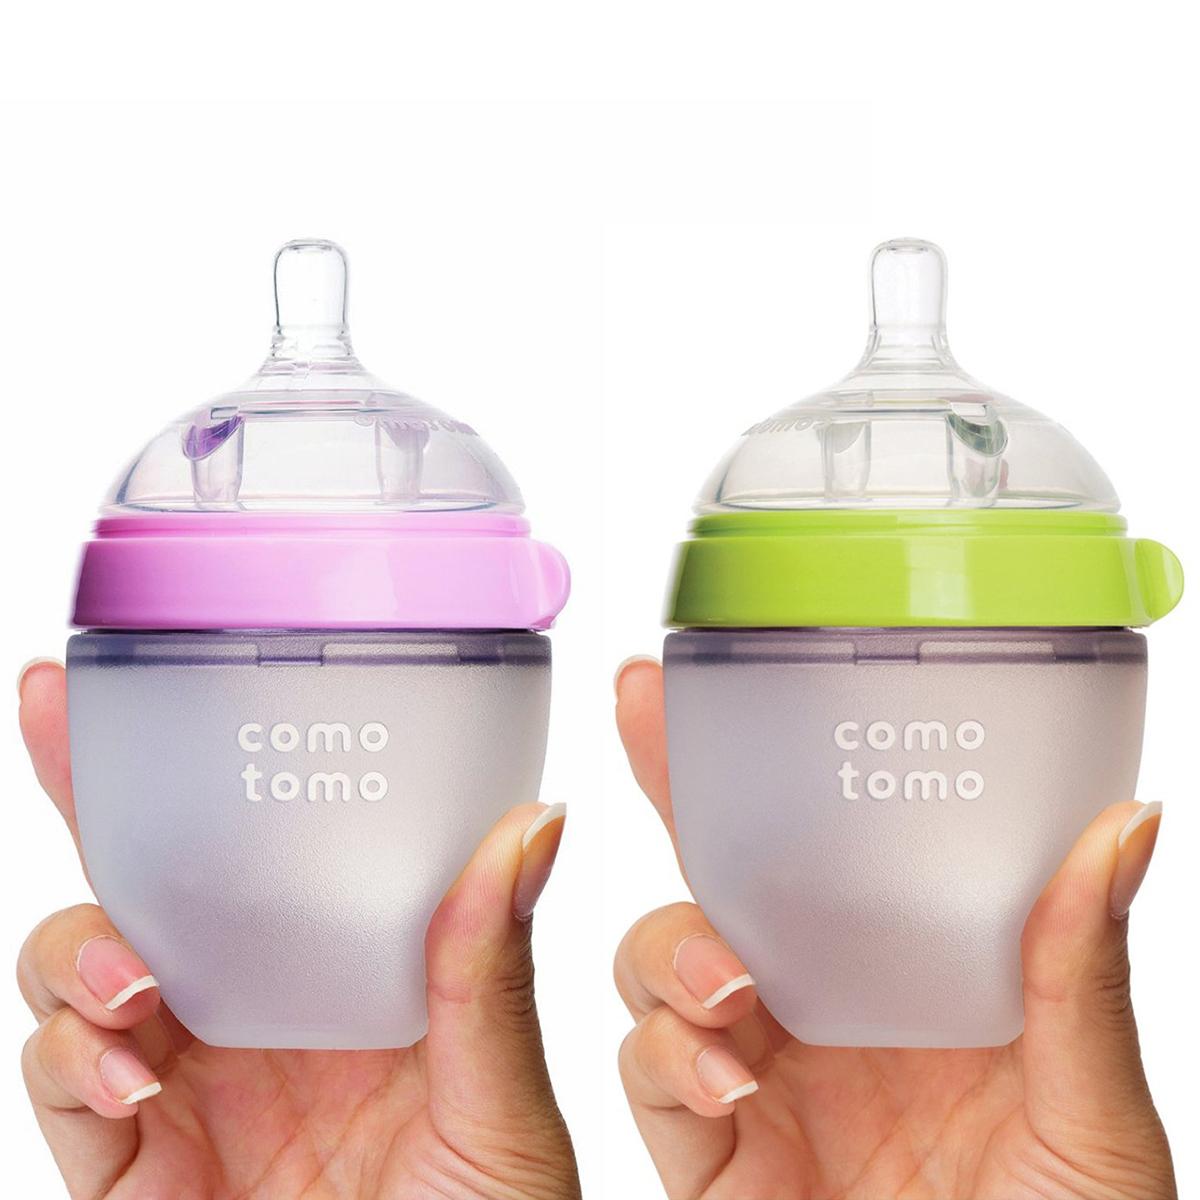 Bình sữa Comotomo 150ml chất liệu silicone mềm mại